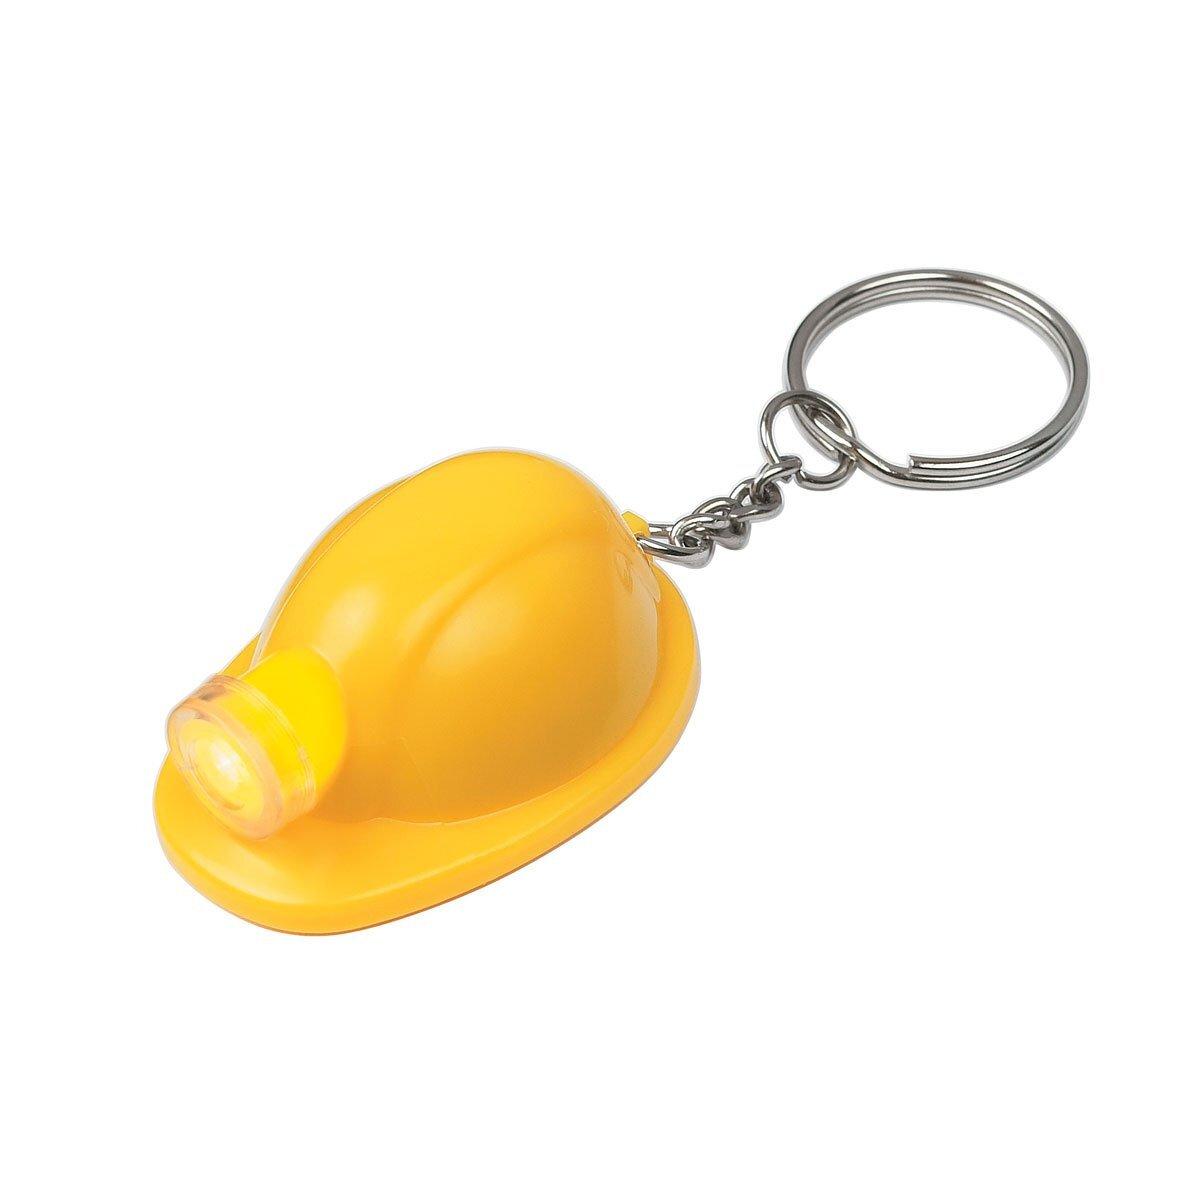 Hard Hat LED Light Key Chain